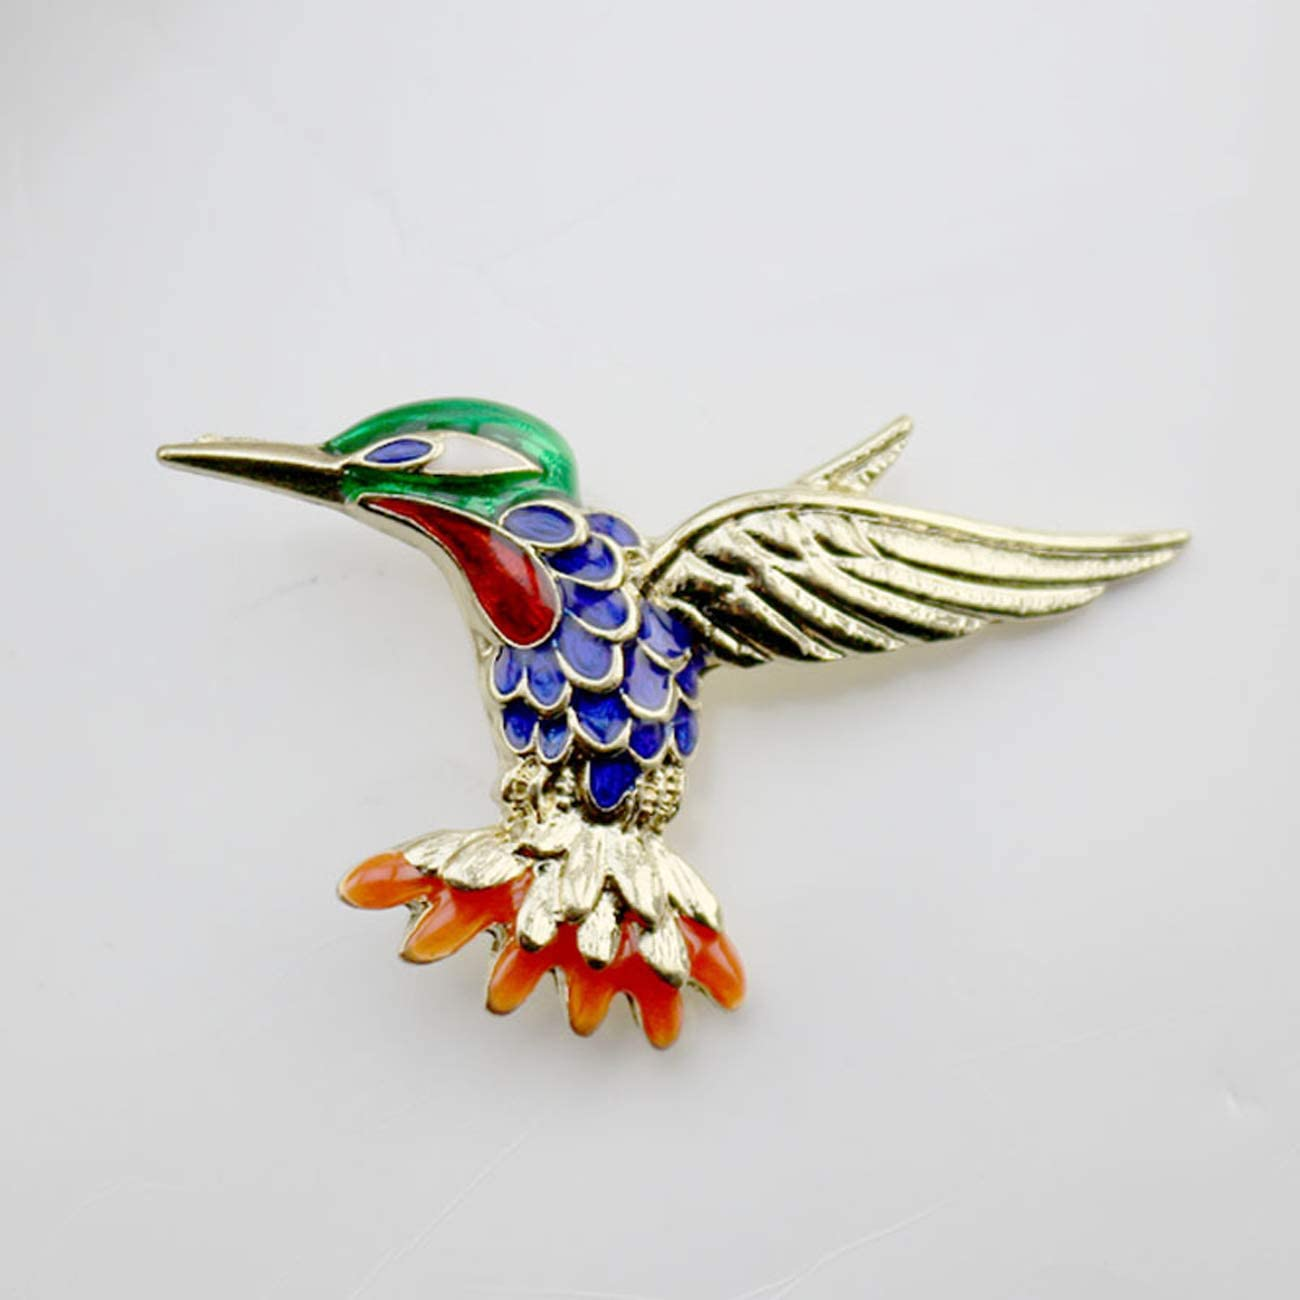 Deer antler carving Hummingbird ornament Bird pin Carved hummingbird Hummingbird jewelry Hummingbird pin Hummingbird brooch